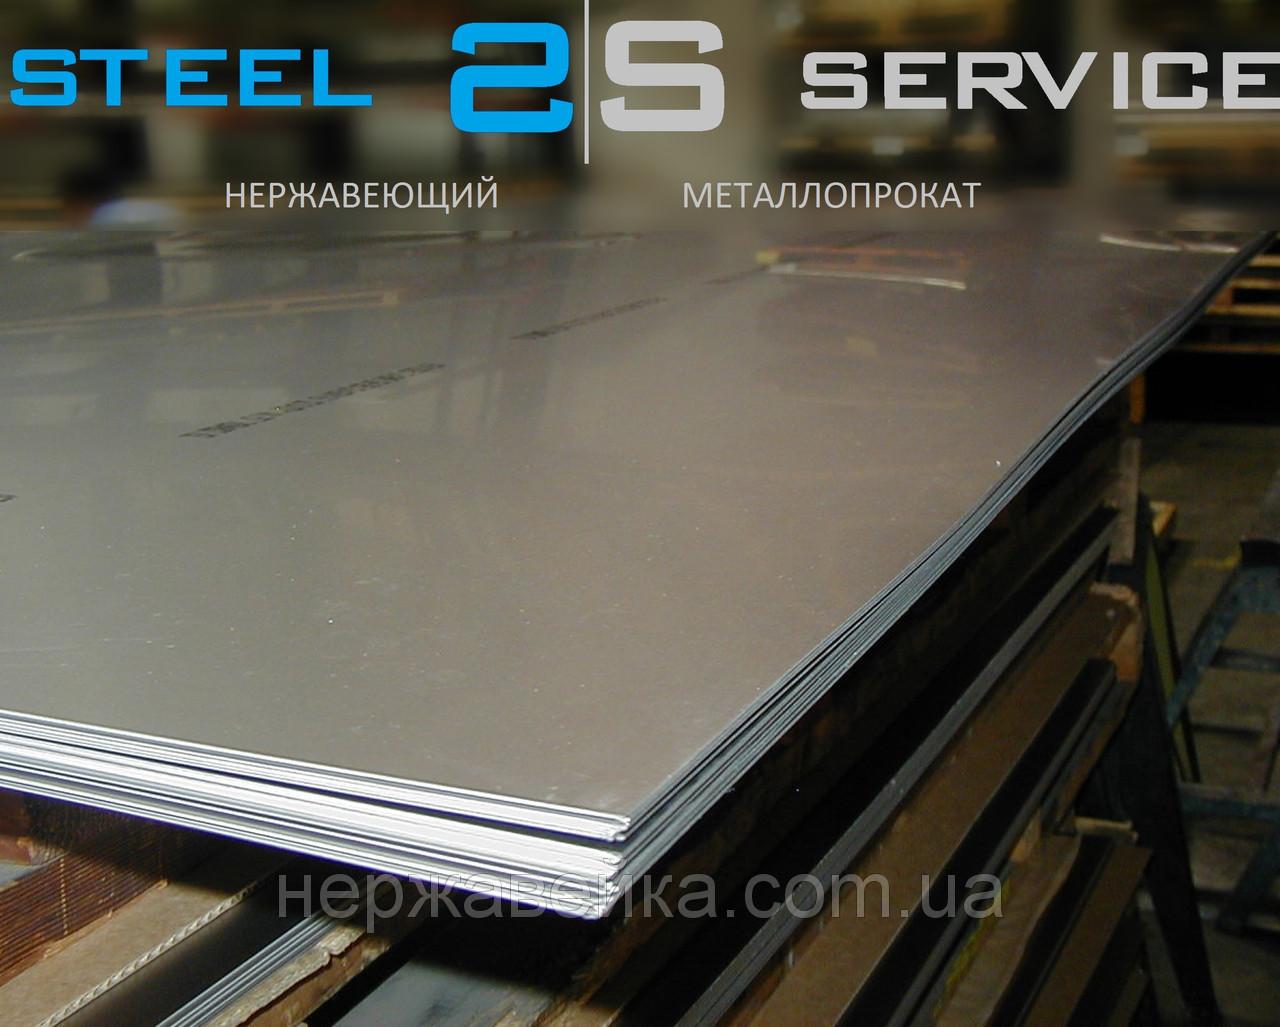 Нержавейка лист 25х1000х2000мм  AISI 316Ti(10Х17Н13М2Т) F1 - горячекатанный,  кислотостойкий